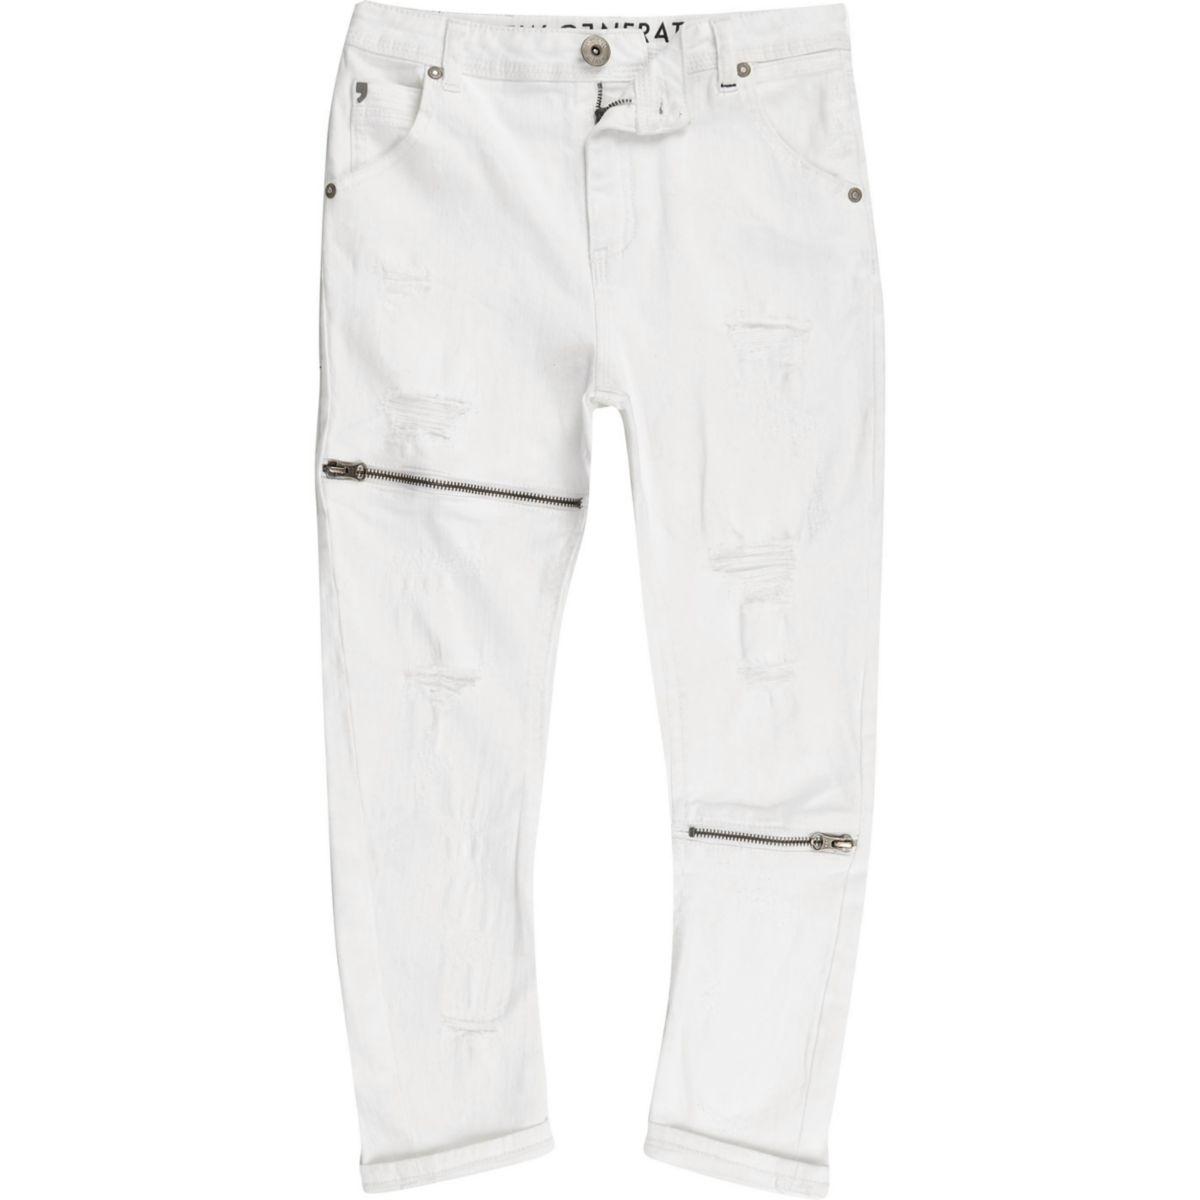 ri studio tony jean large blanc d chir pour enfant denim promo fille. Black Bedroom Furniture Sets. Home Design Ideas